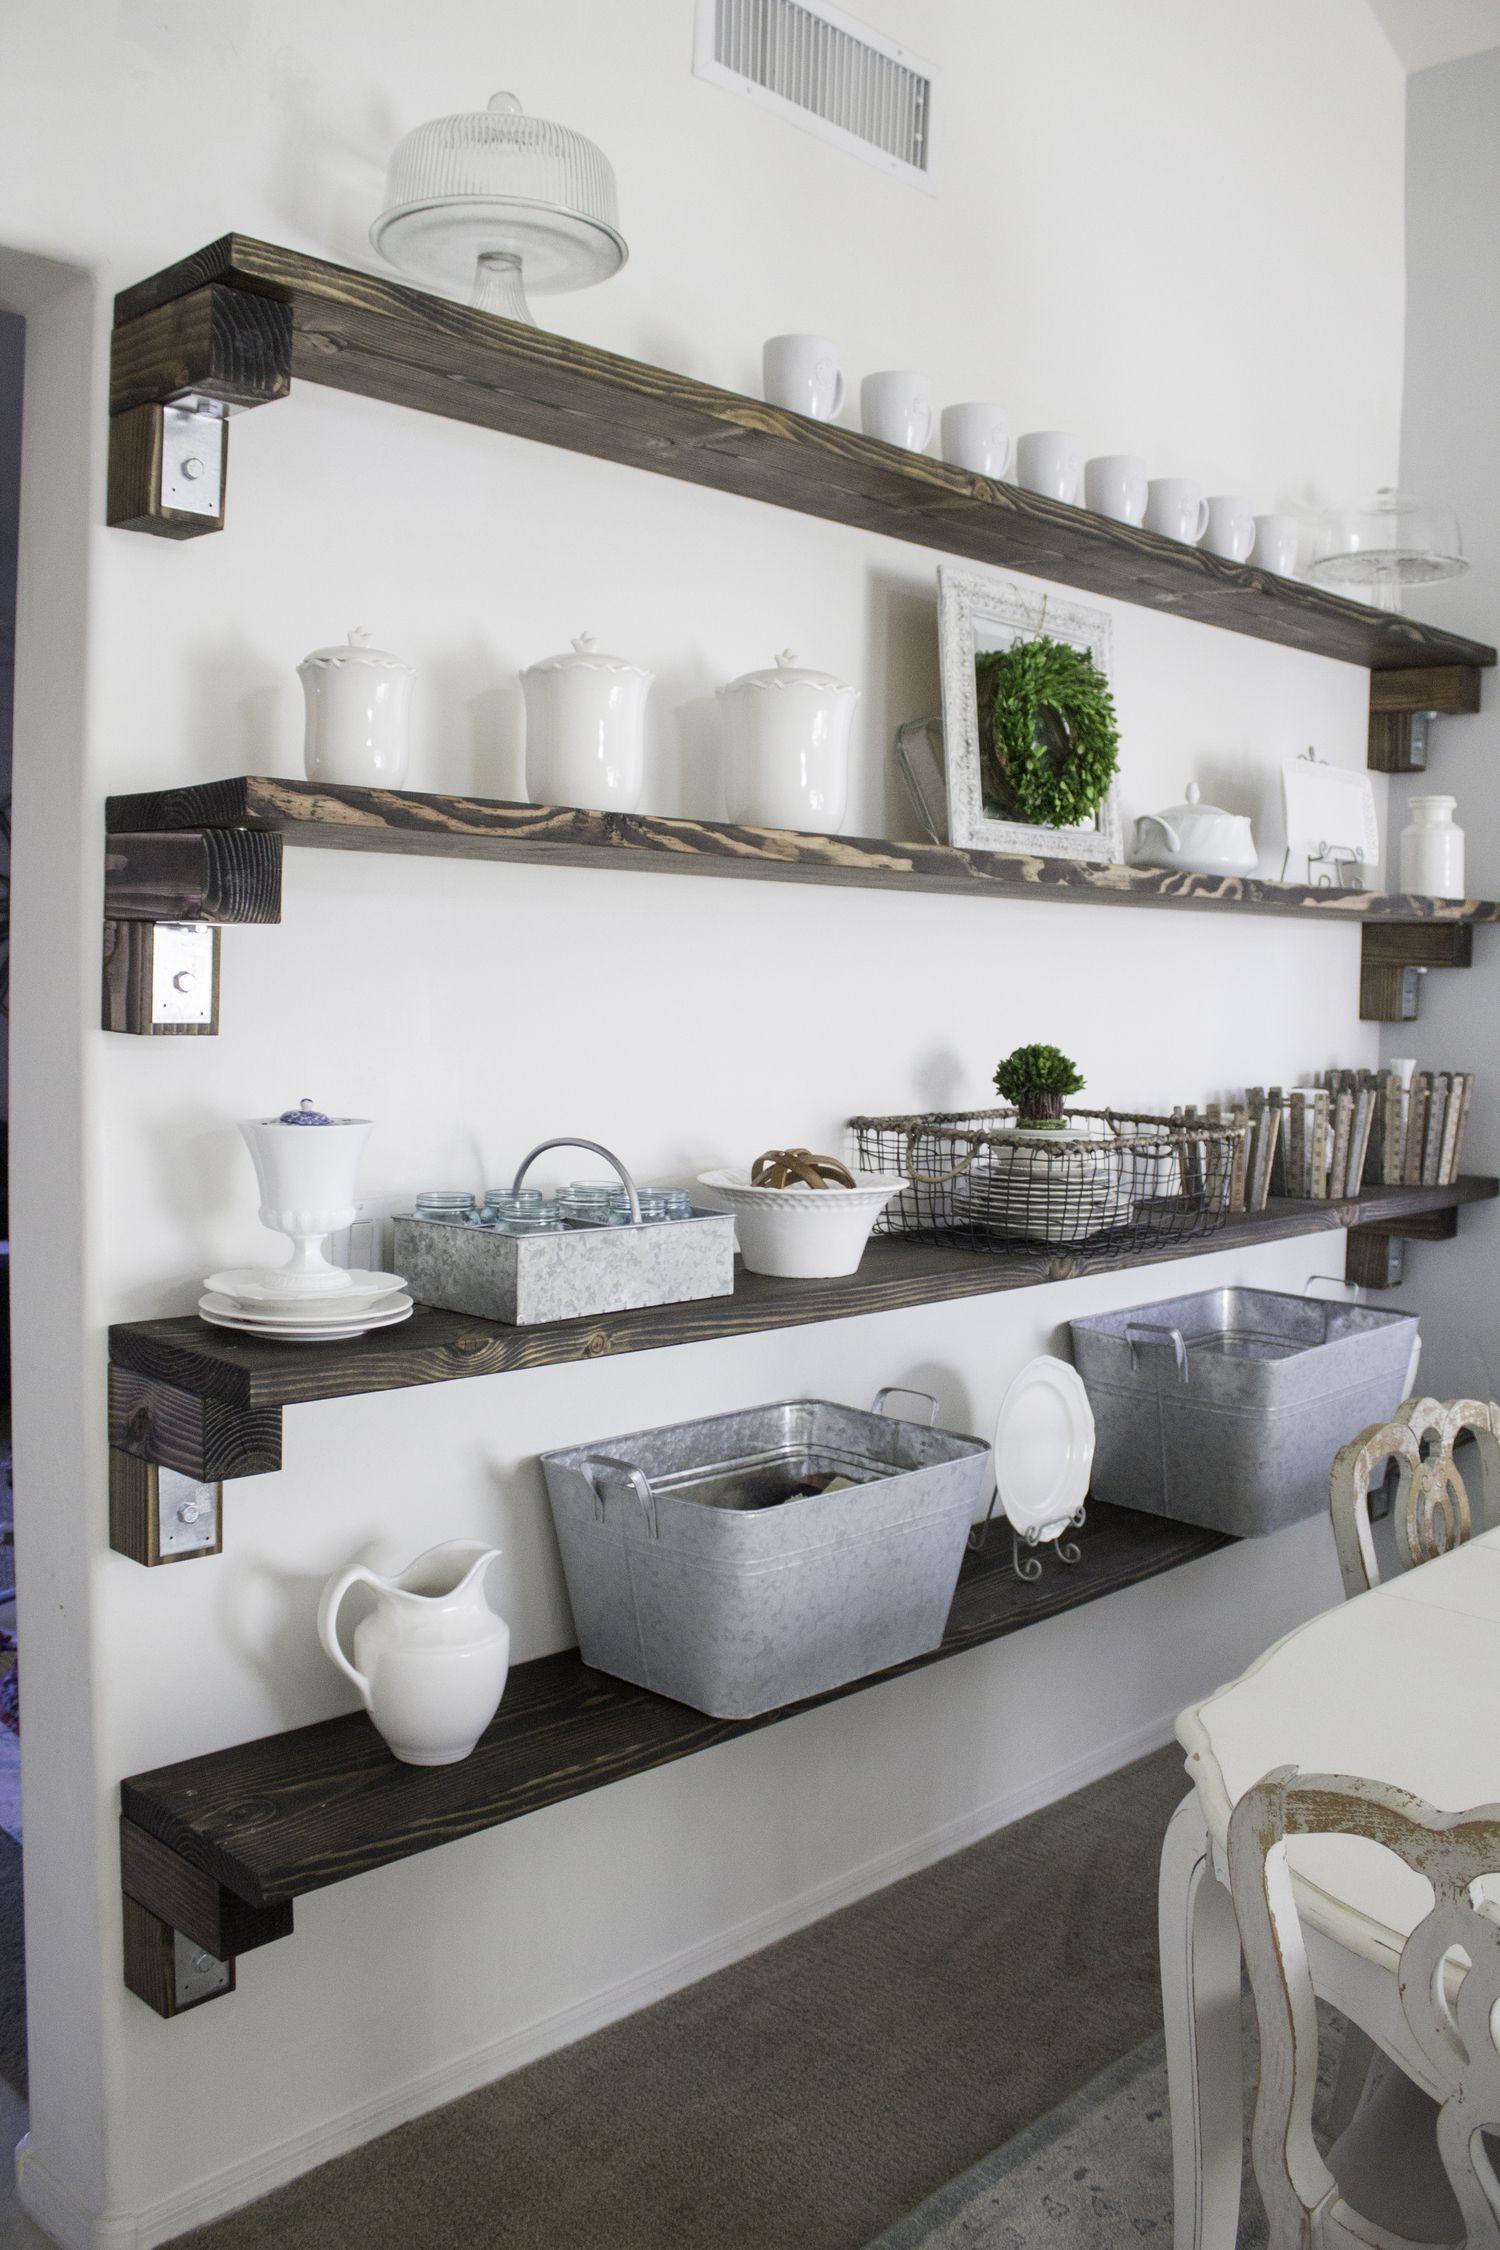 Farmhouse Storage And Organization Ideas Dining Room